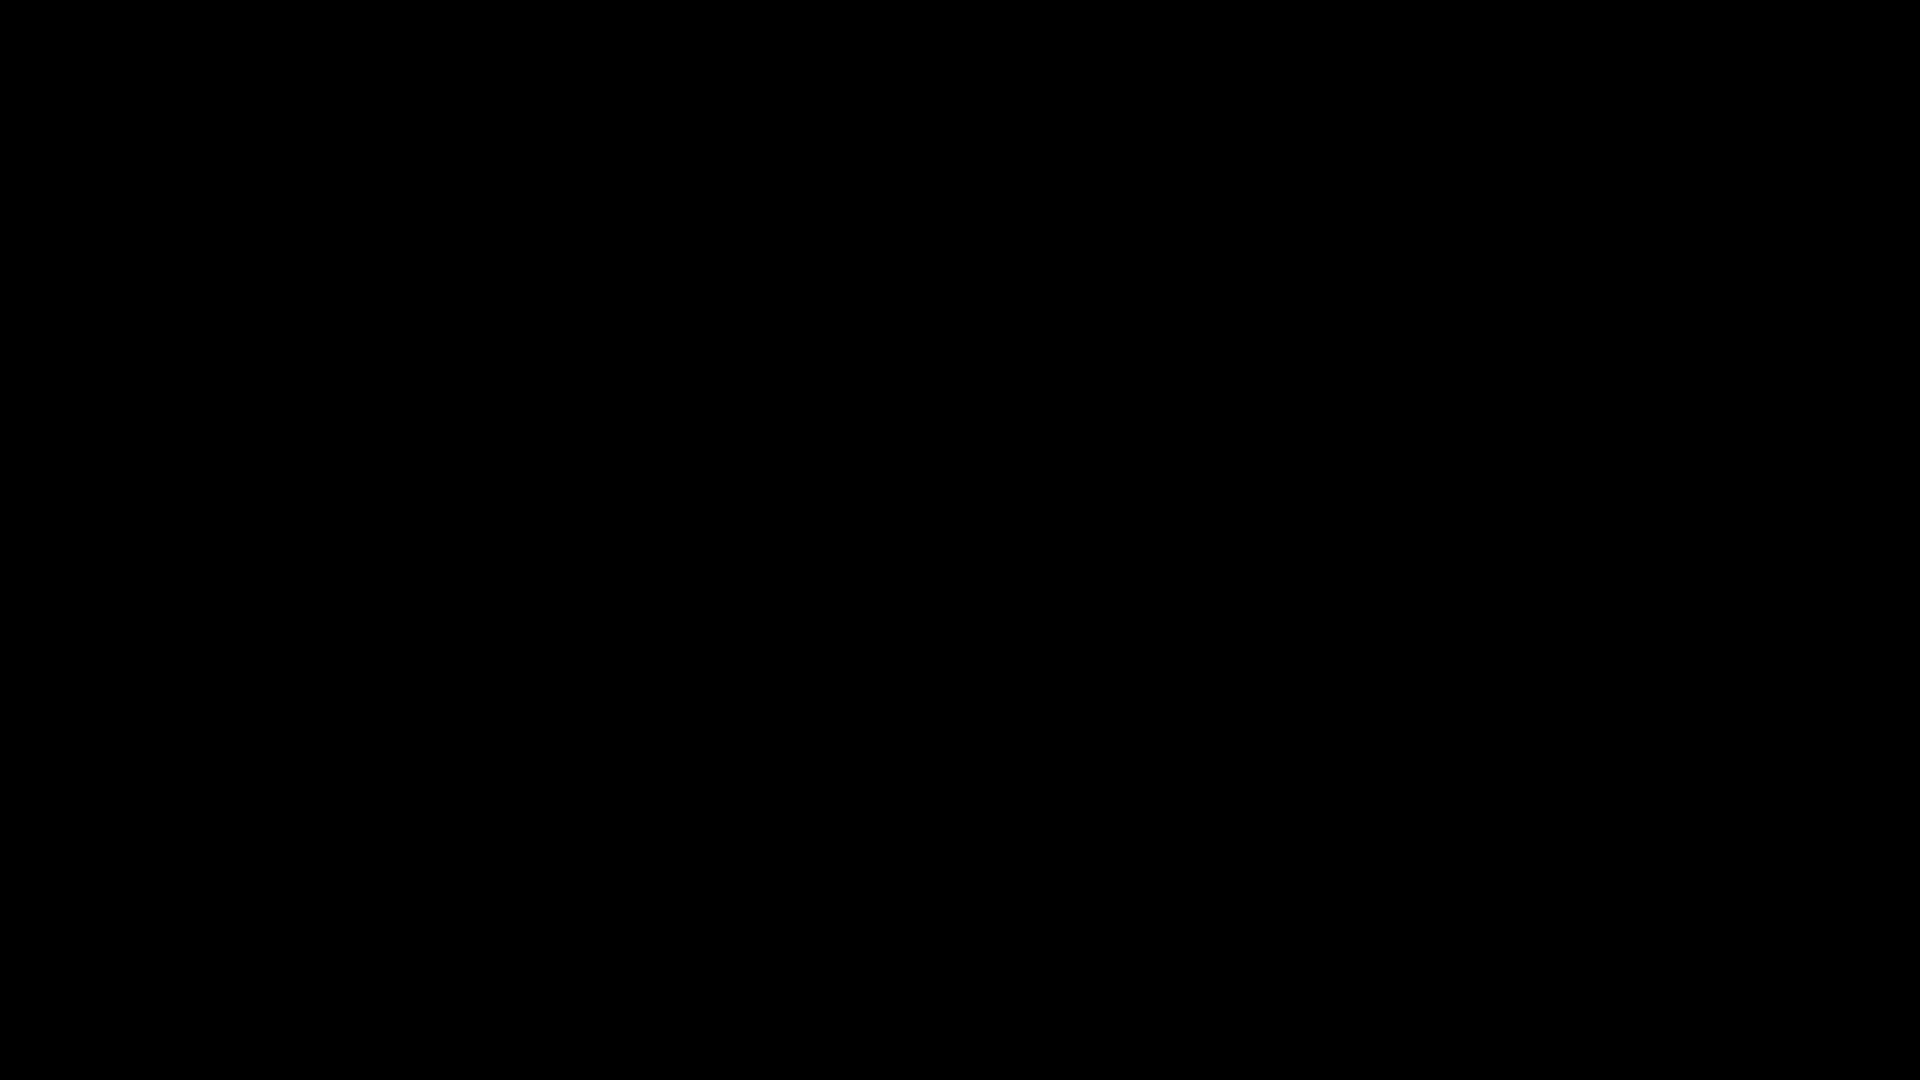 Fifth Gear, Jason Plato, NCAP, Smart (Organization), Tiff Needell, Top Gear, Vicki Butler-Henderson, car, car review, concrete, crash, crash test, deadly, epic crash, fast, fifth, gear, review, smart car, throwback thursday, Smart Car Crash Test #TBT- Fifth Gear GIFs